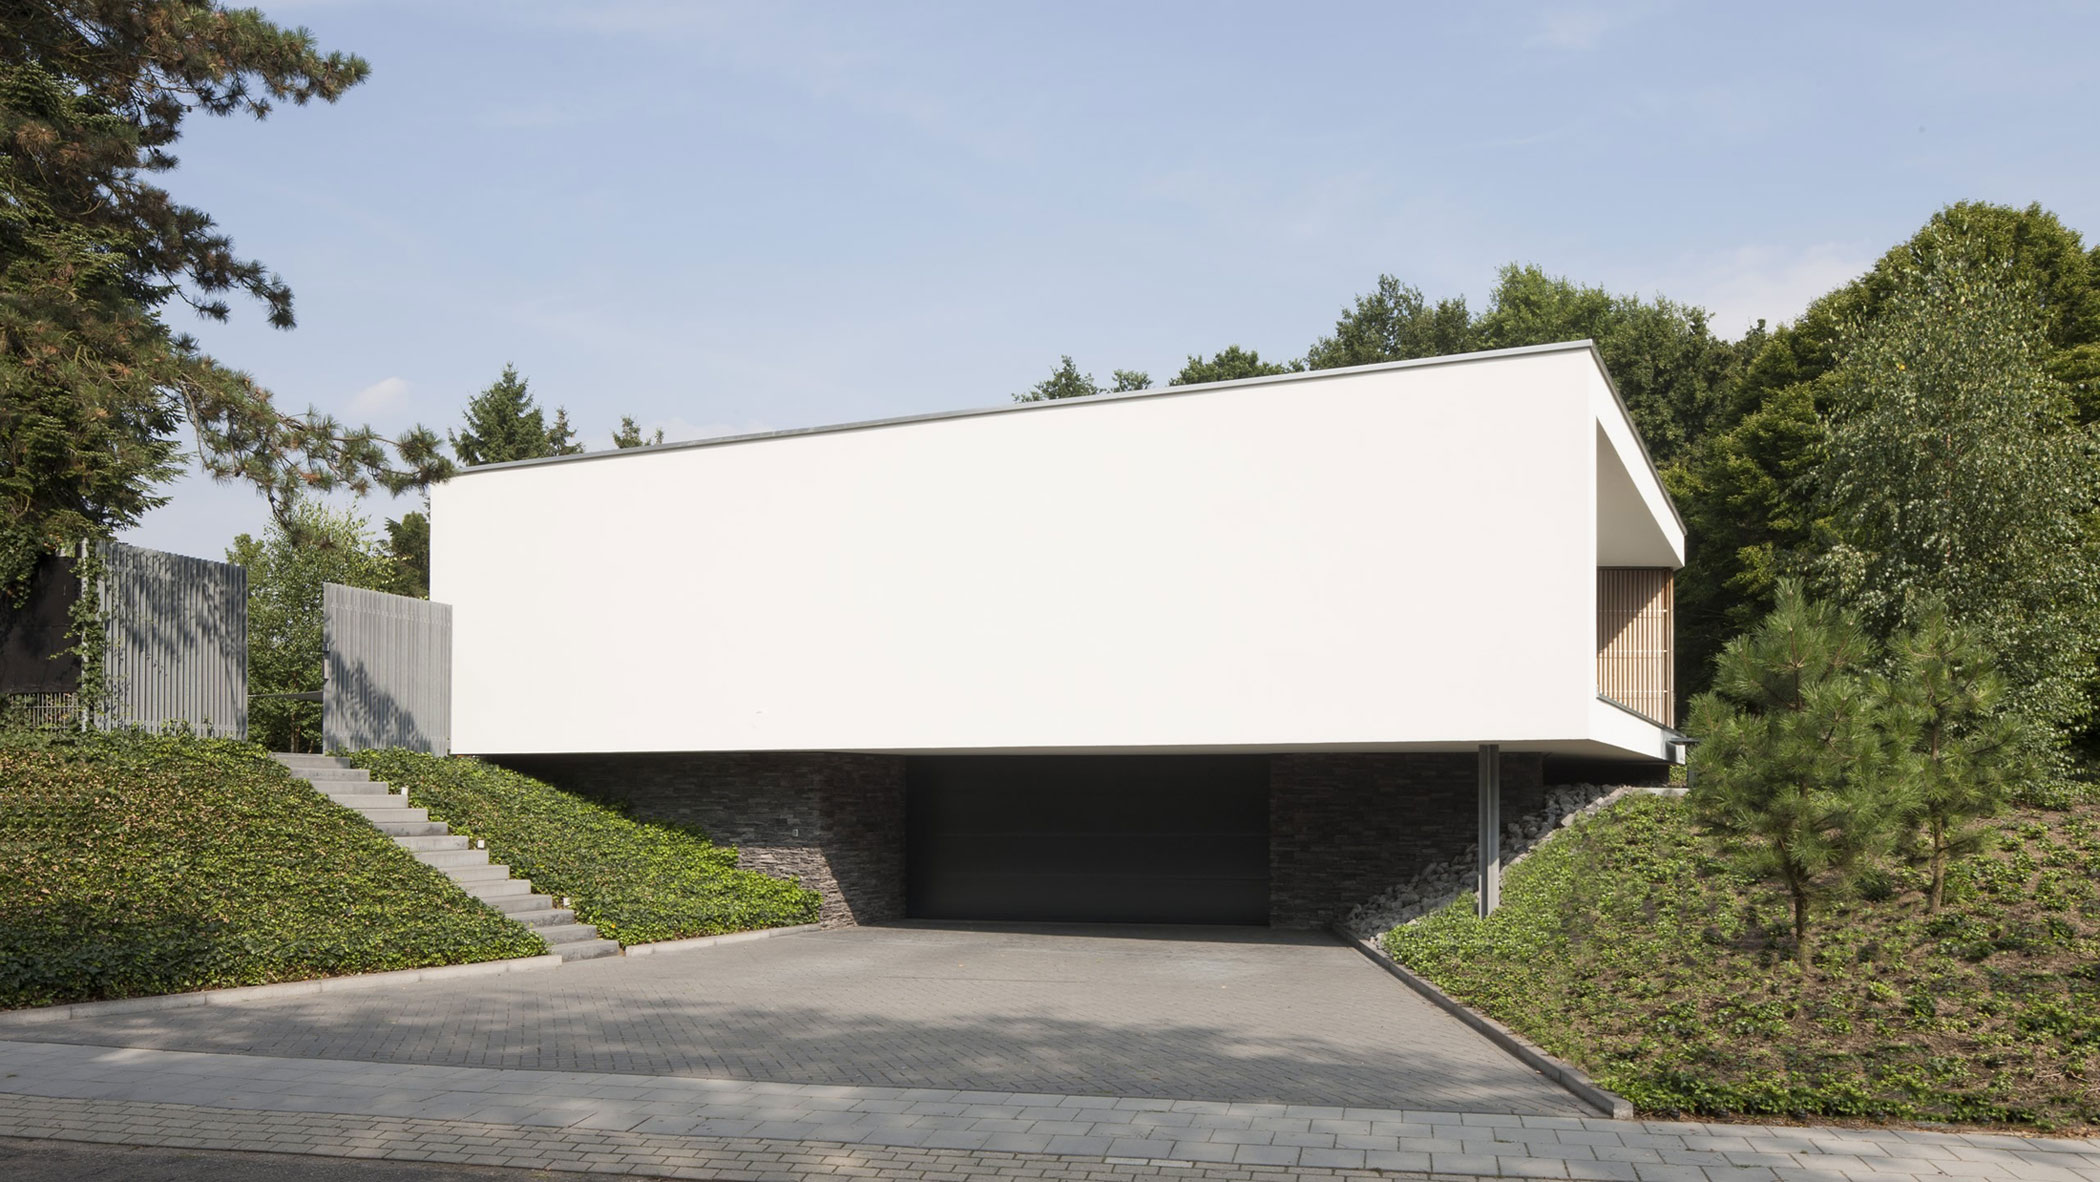 Boxed Villa Spee Haelen with Panoramic Windows by Lab32 architecten-03